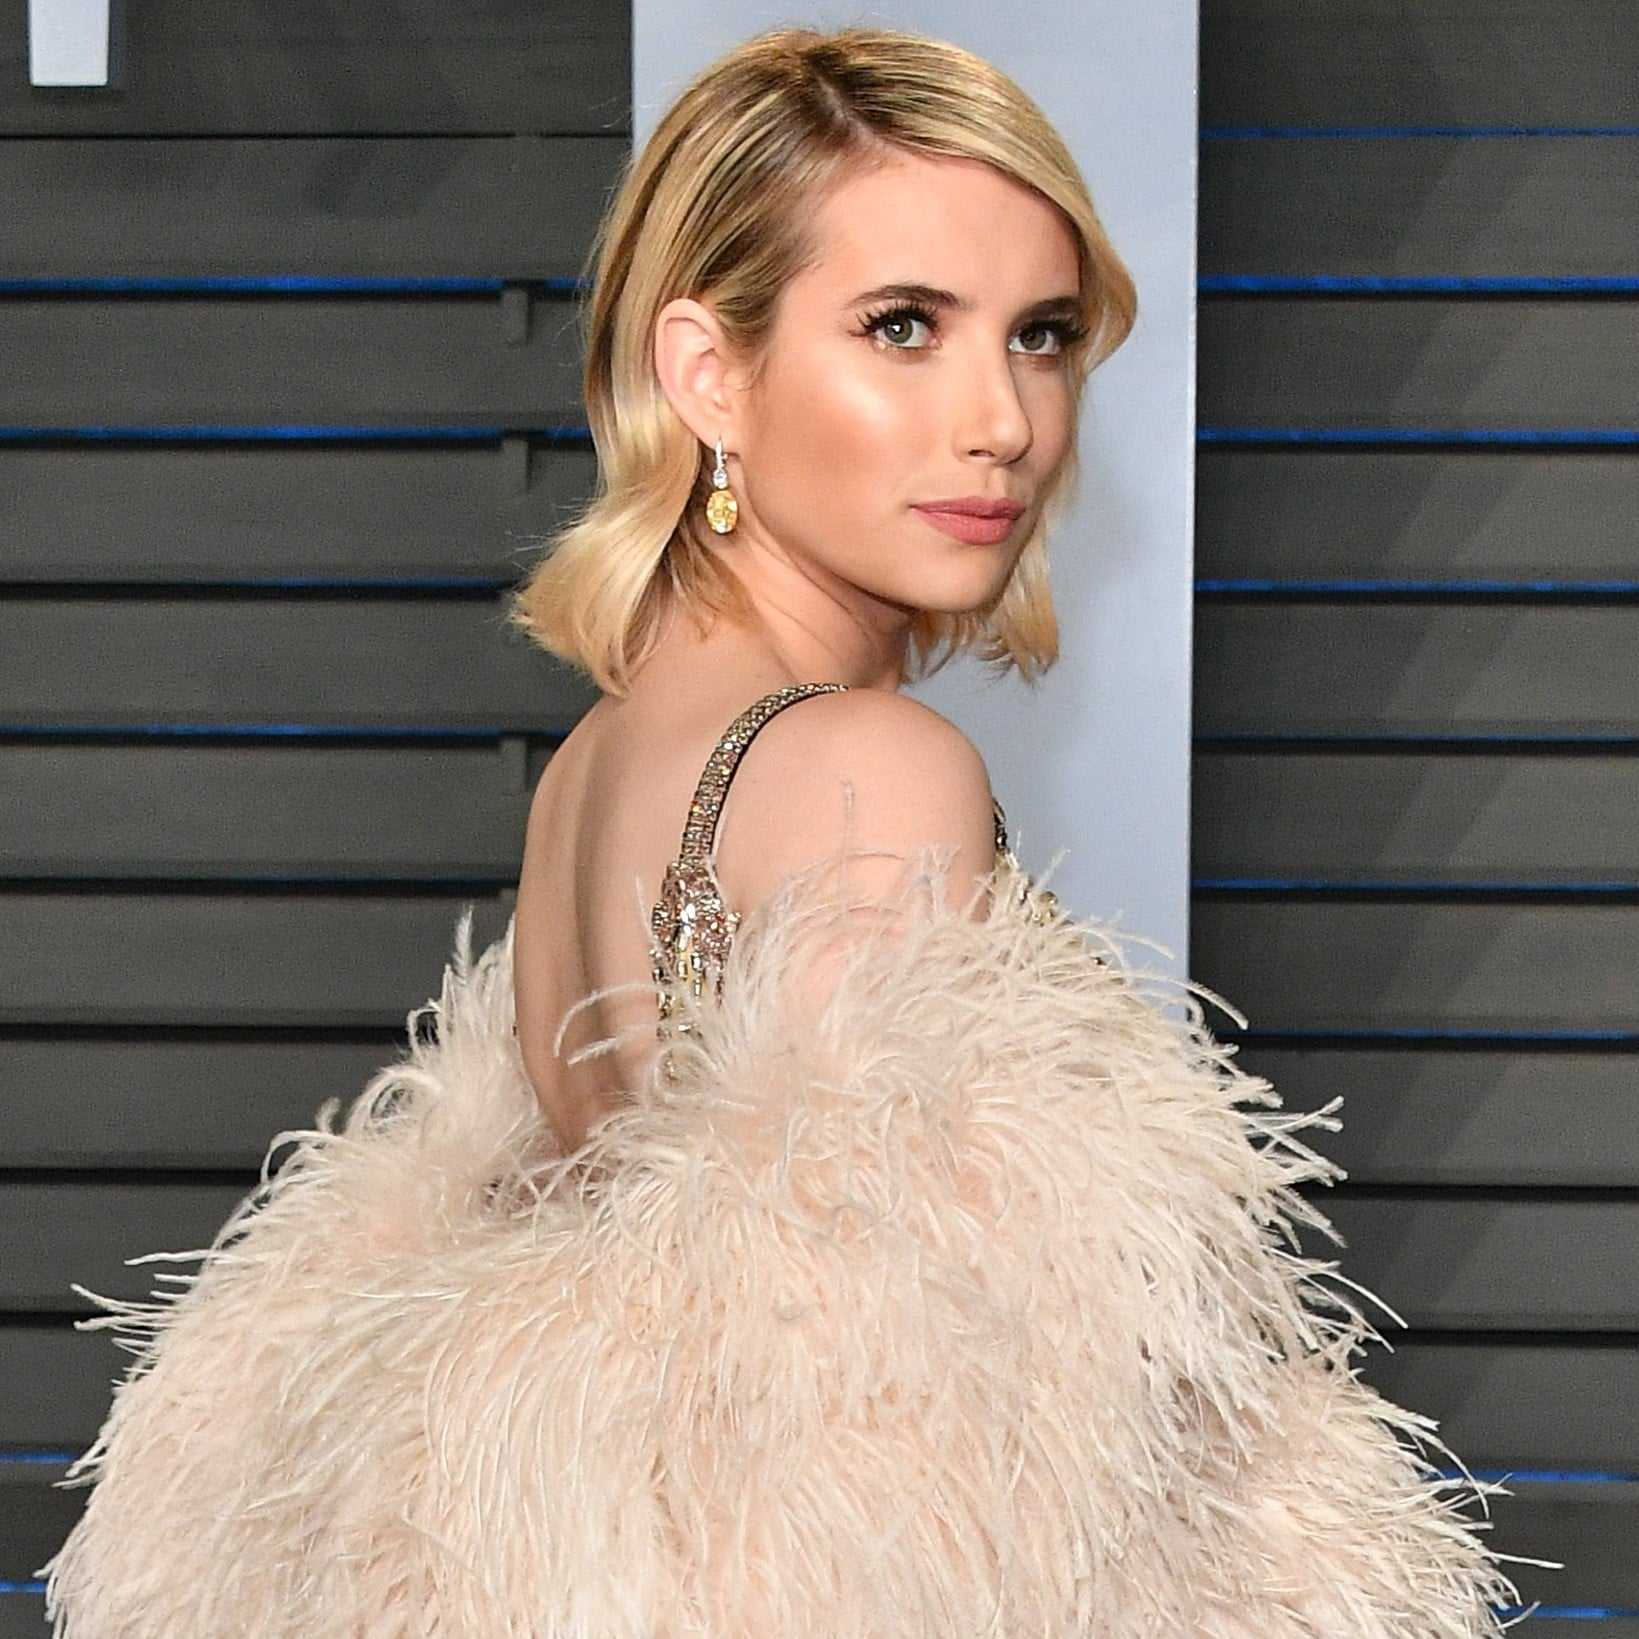 Emma Roberts Prada Dress At Oscars Afterparty 2018 Popsugar Fashion